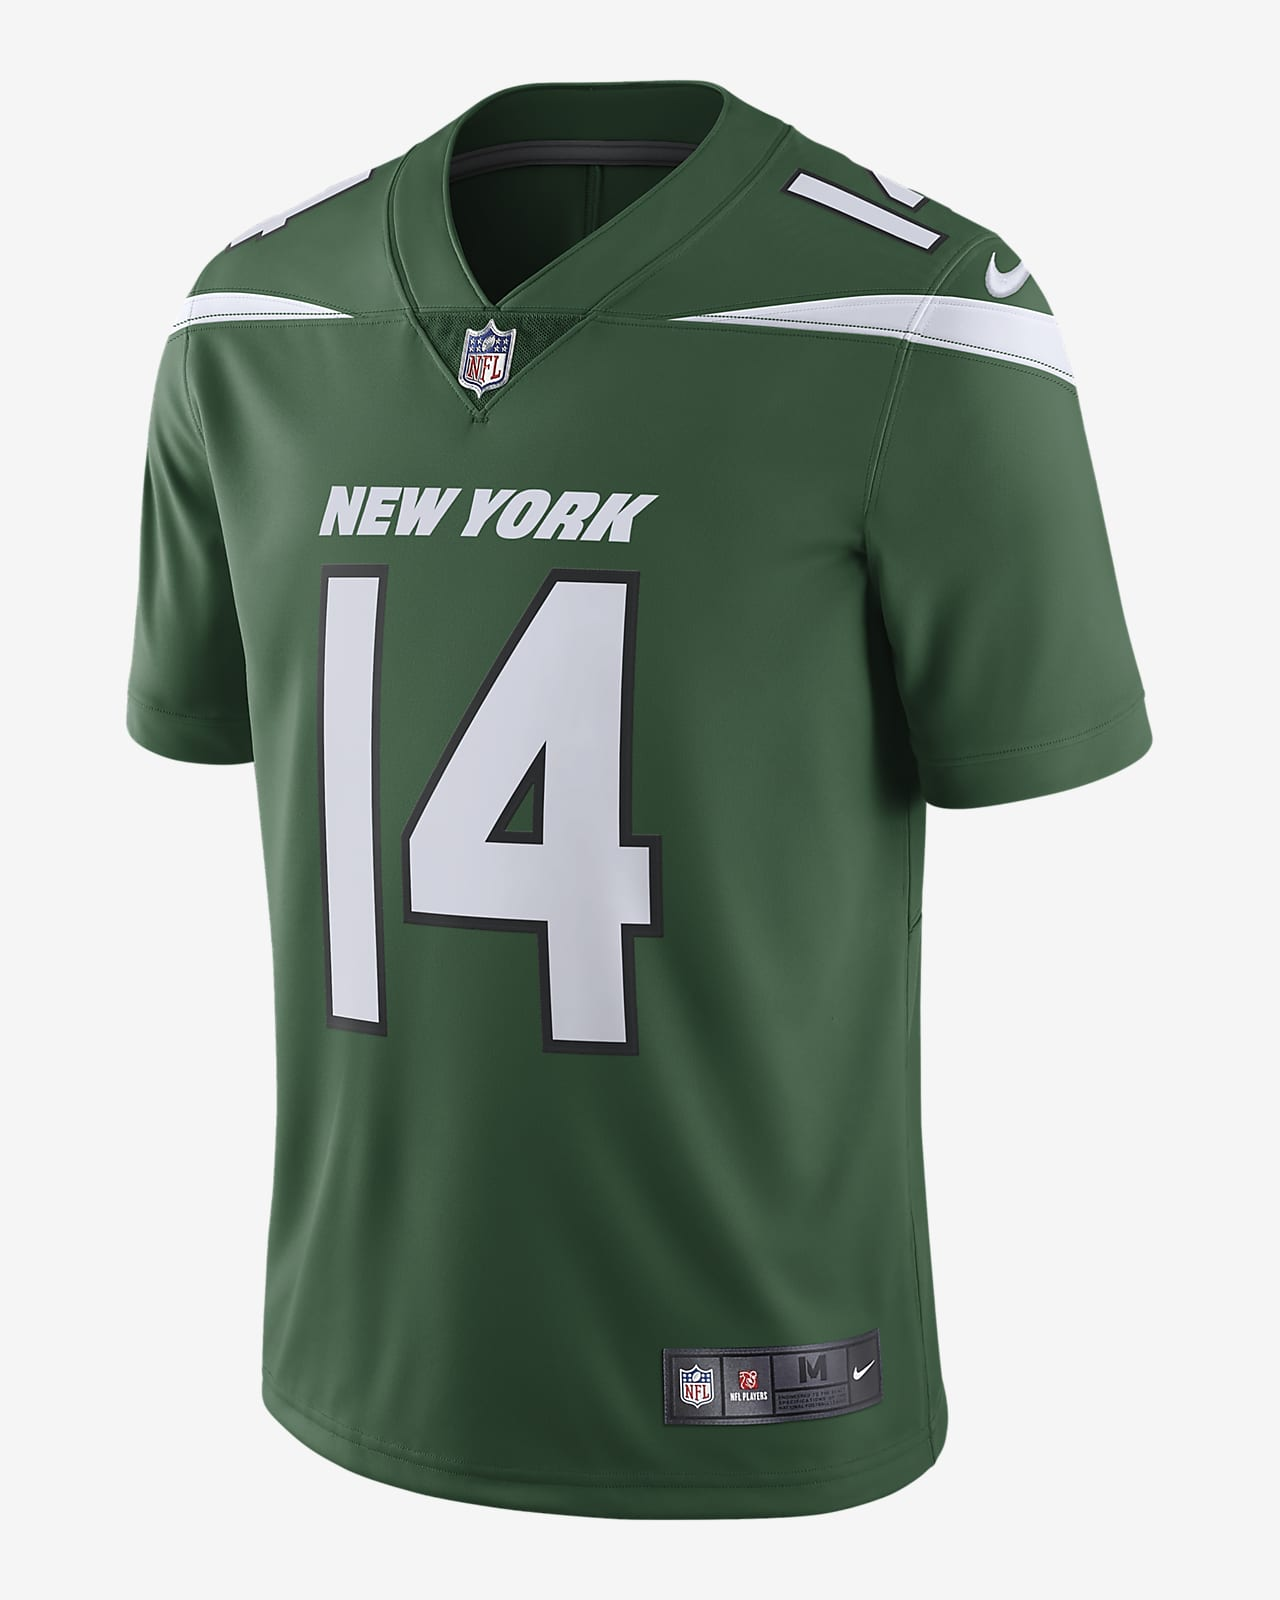 NFL New York Jets Vapor Untouchable (Sam Darnold) Men's Limited Football Jersey